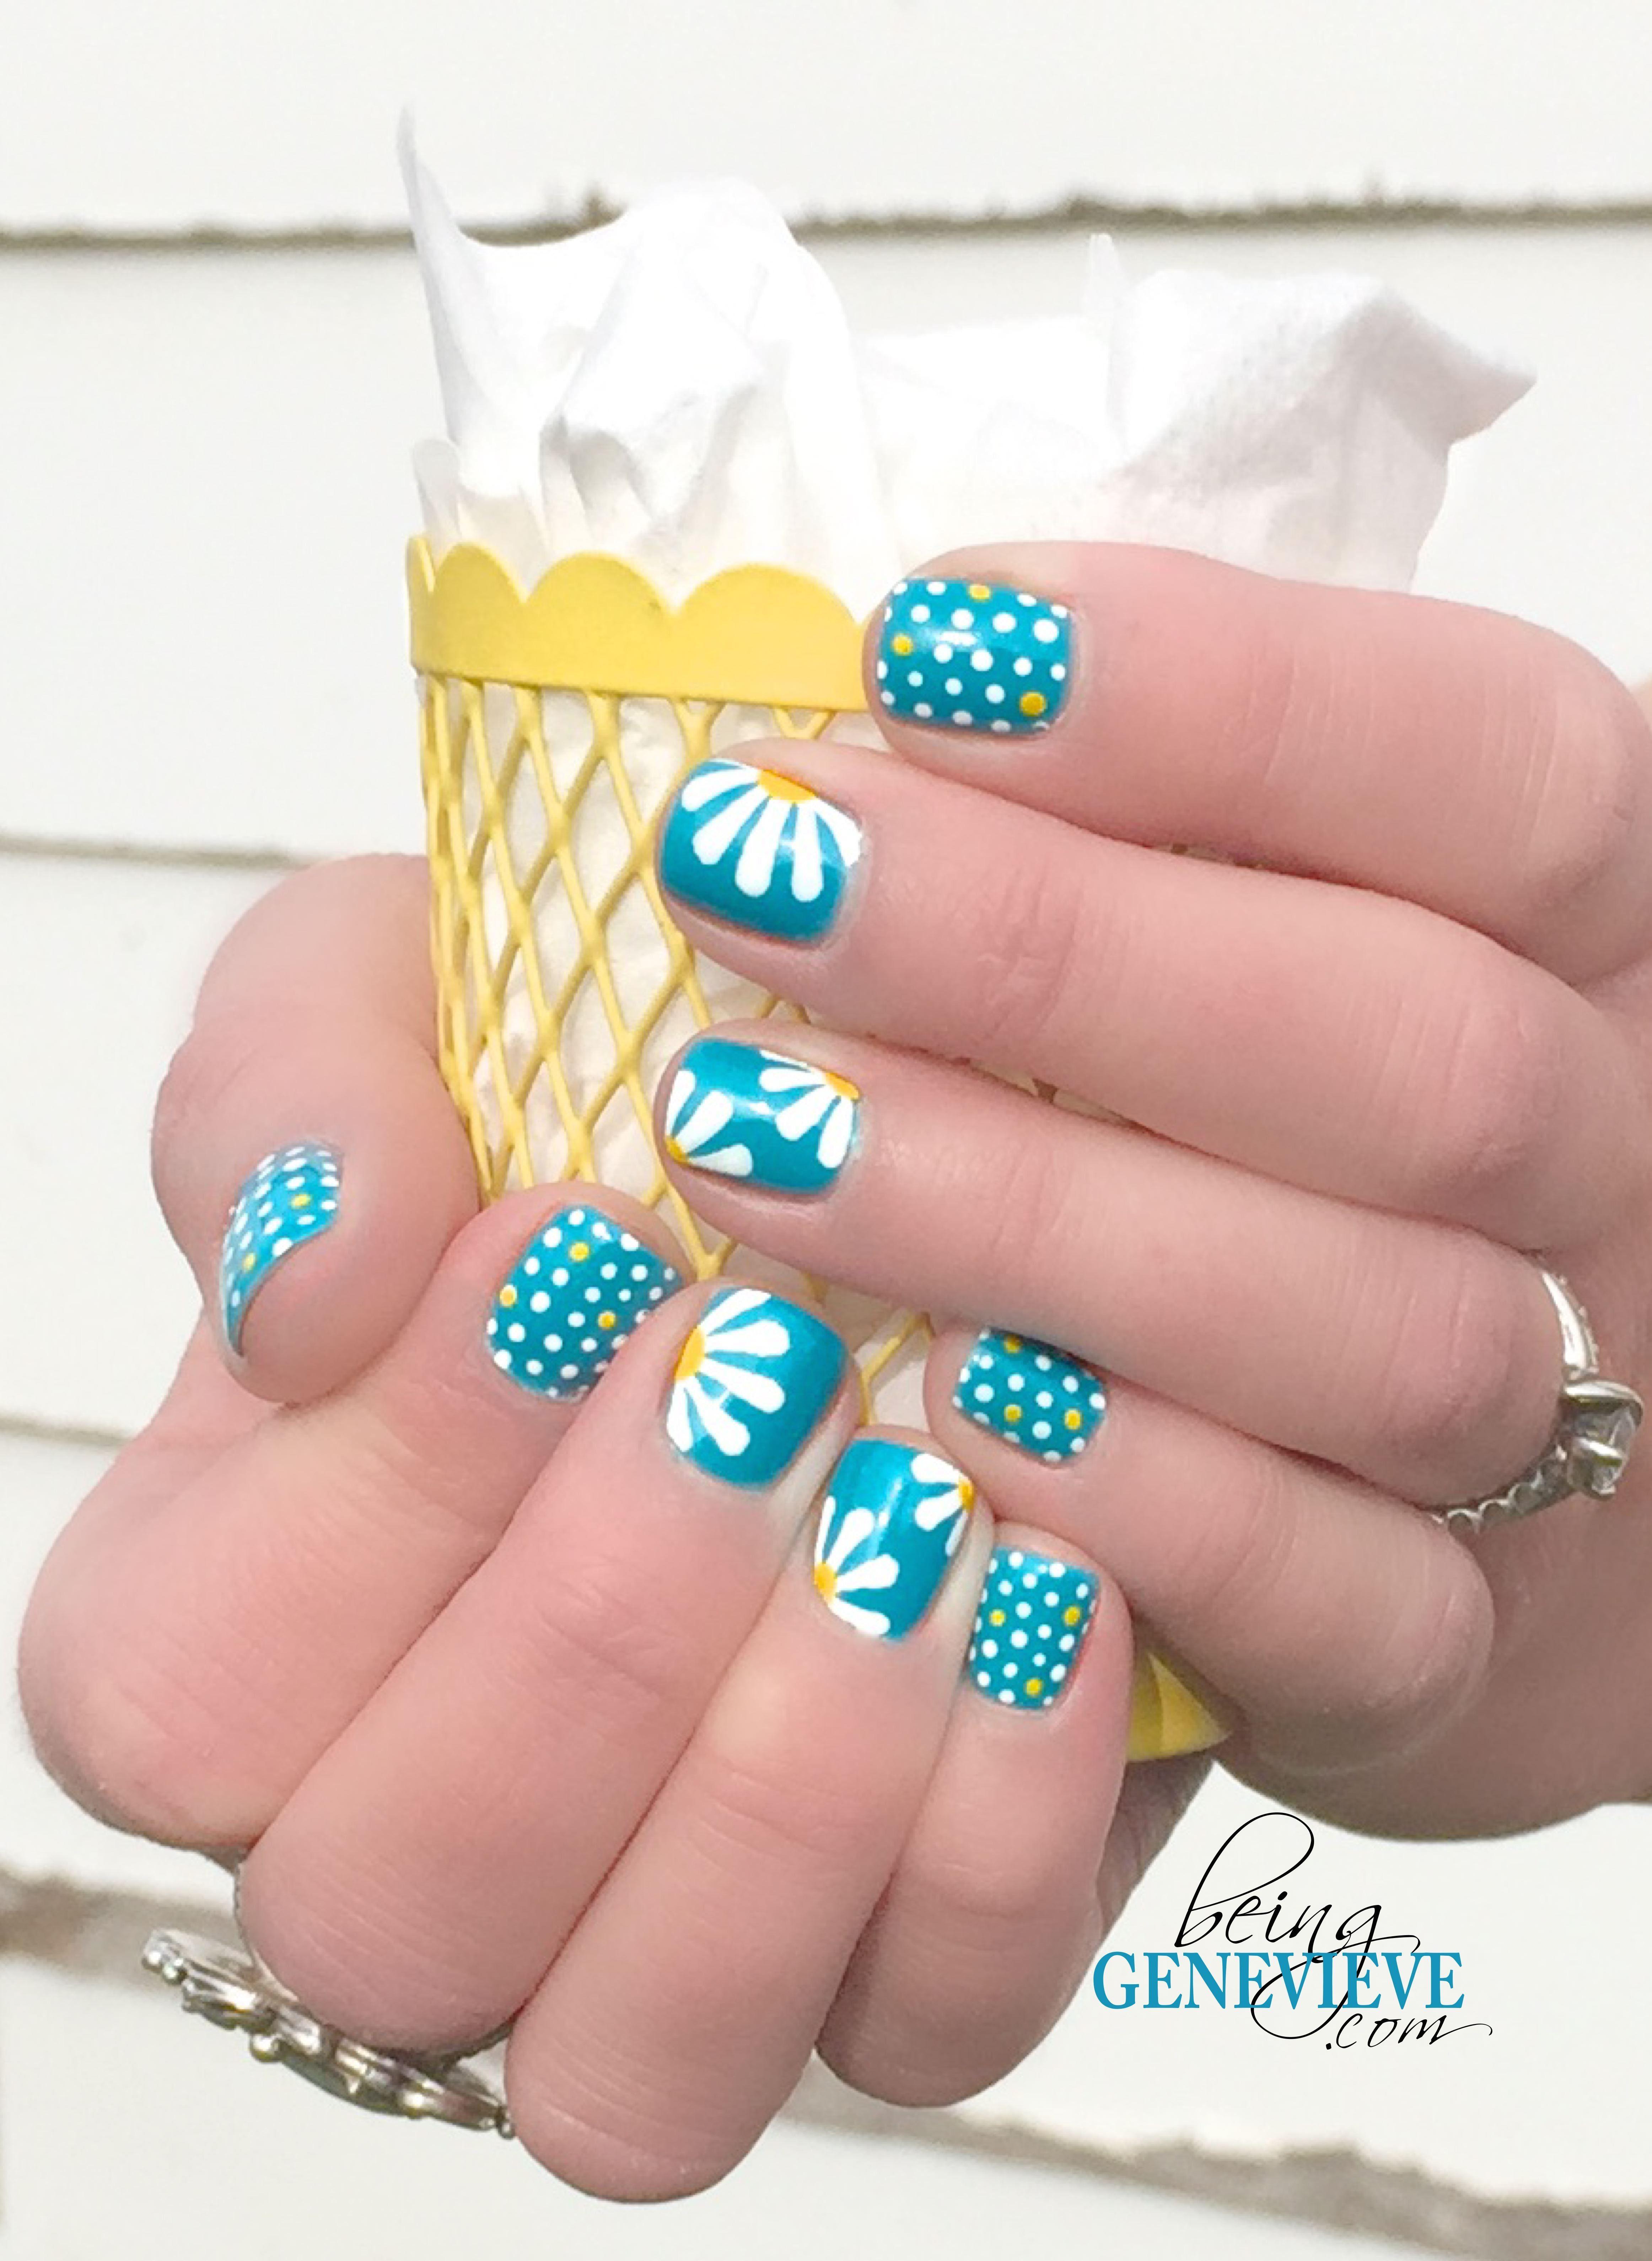 Uñas Decoradas Con Flores Nails With Flowers Nail Art Pinterest